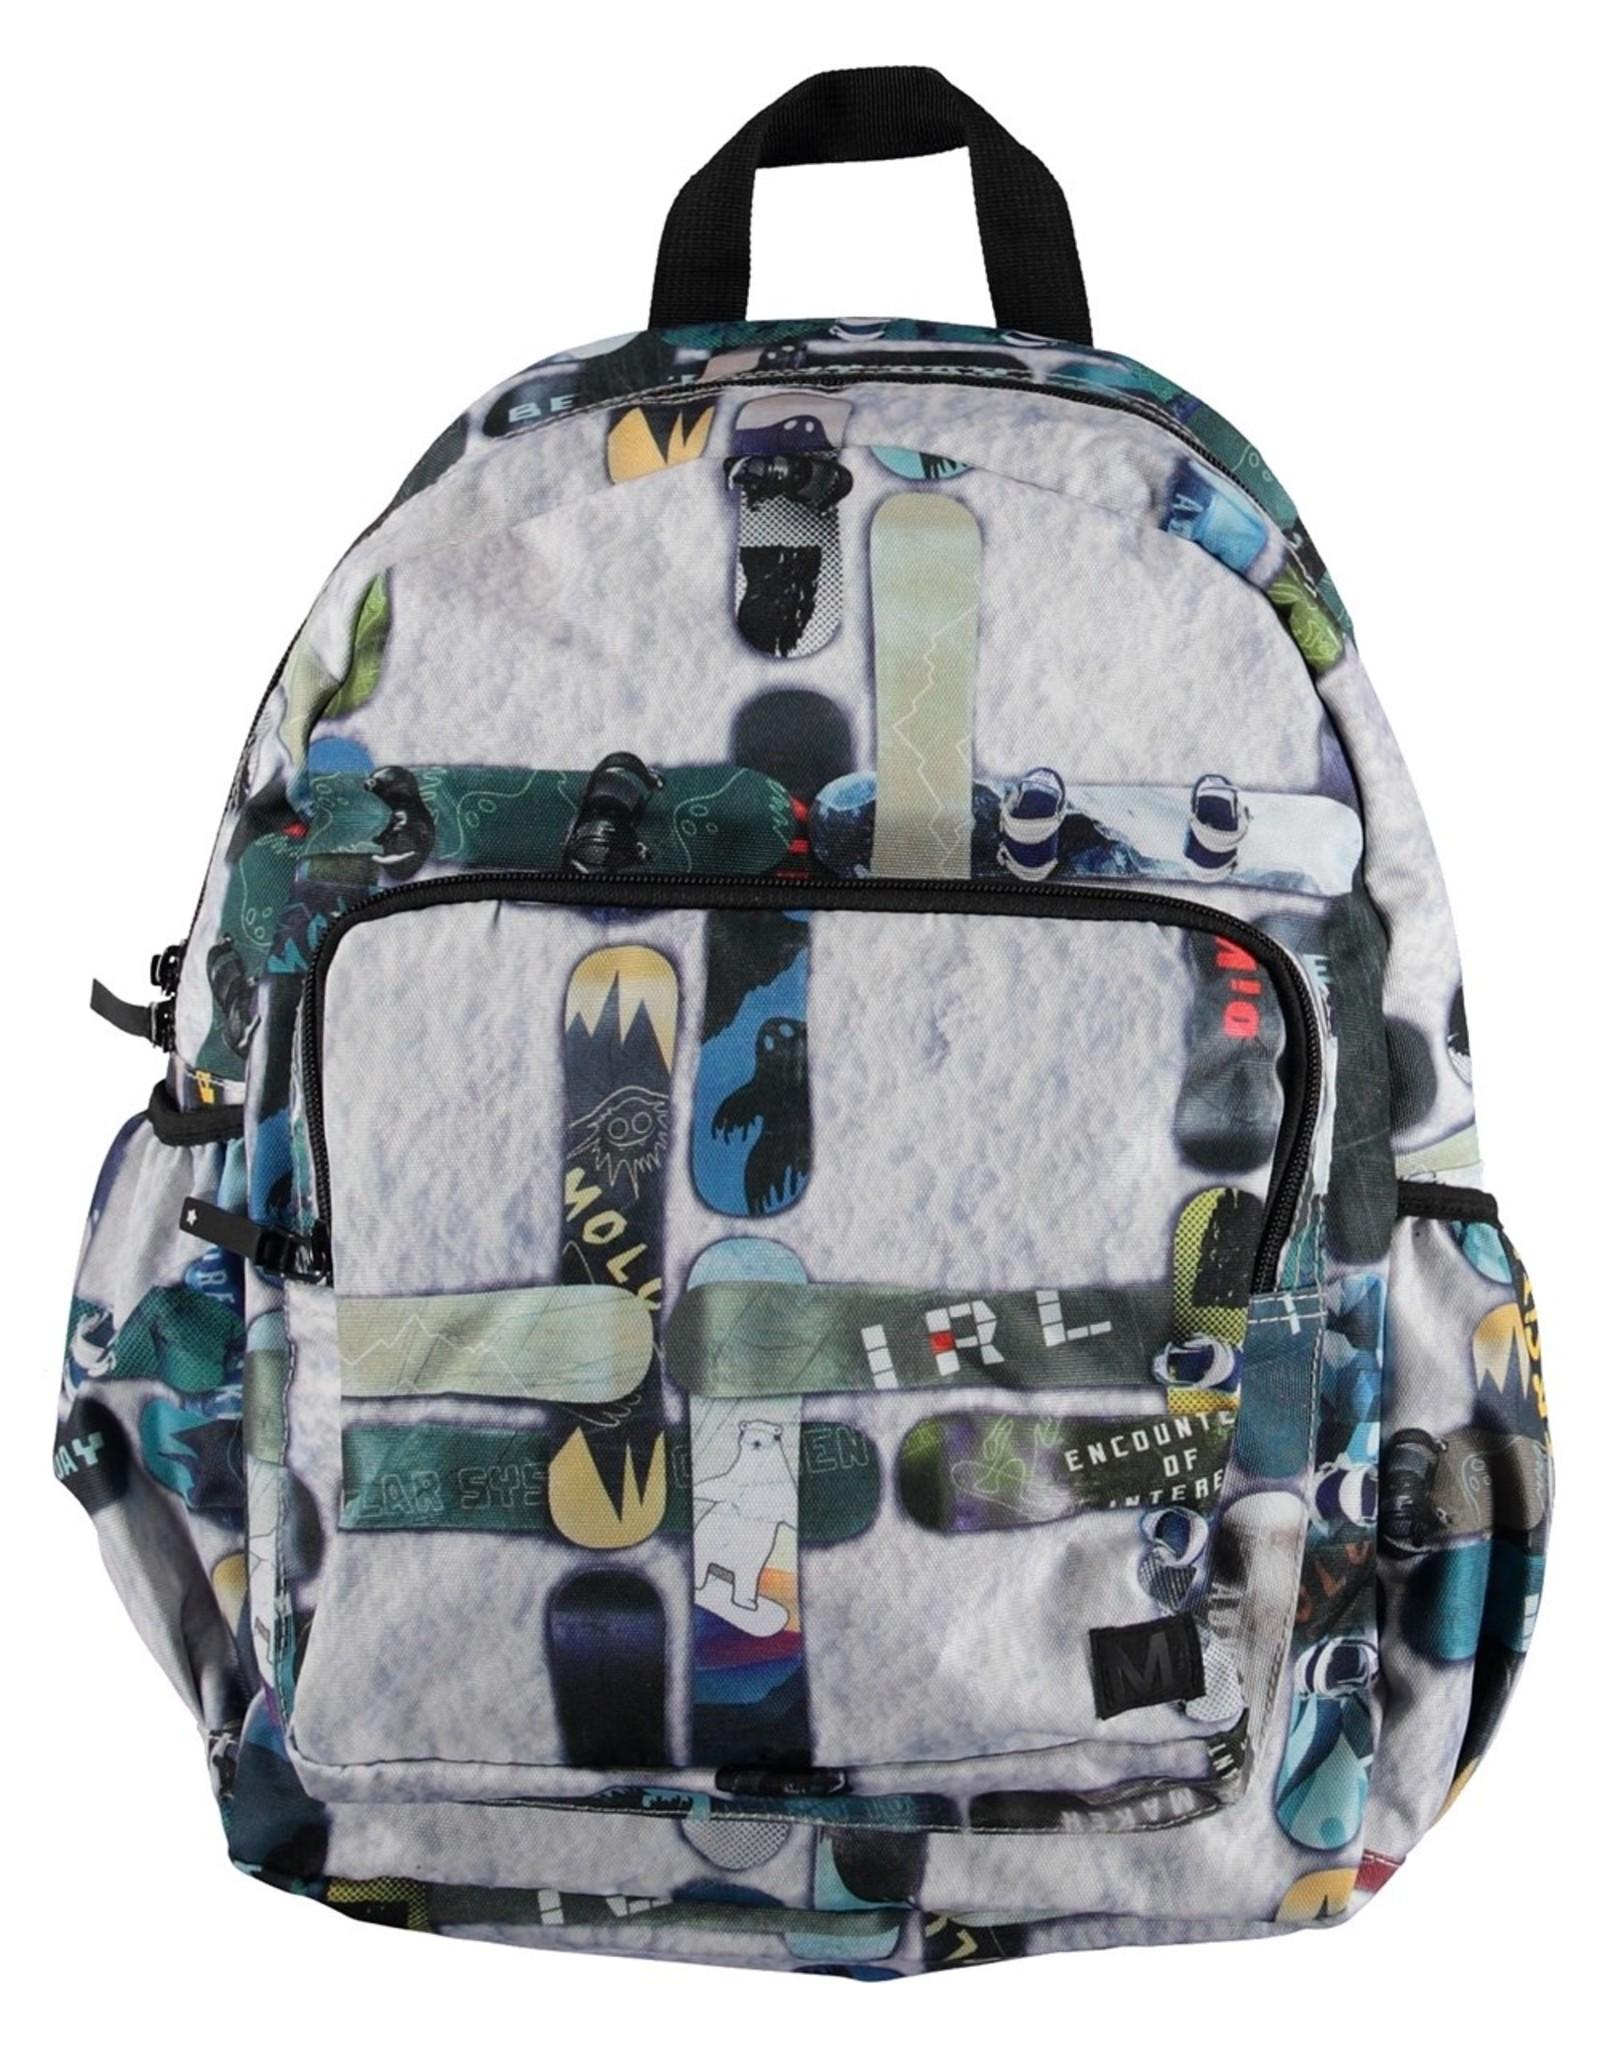 Molo Molo Big Backpack- Snowboard Check